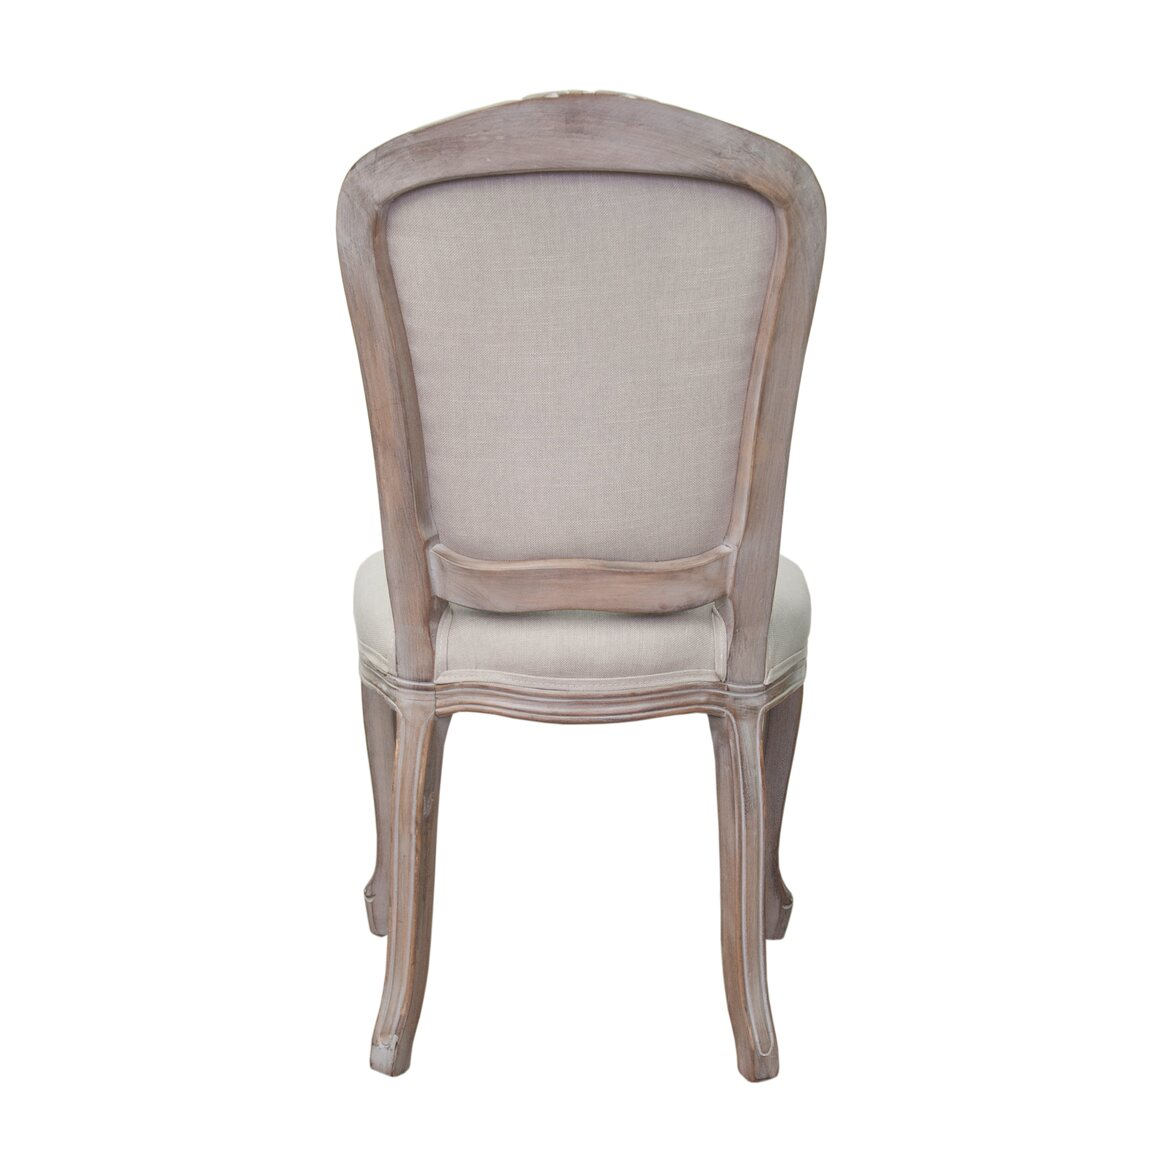 Стул Gran beige 3 | Обеденные стулья Kingsby